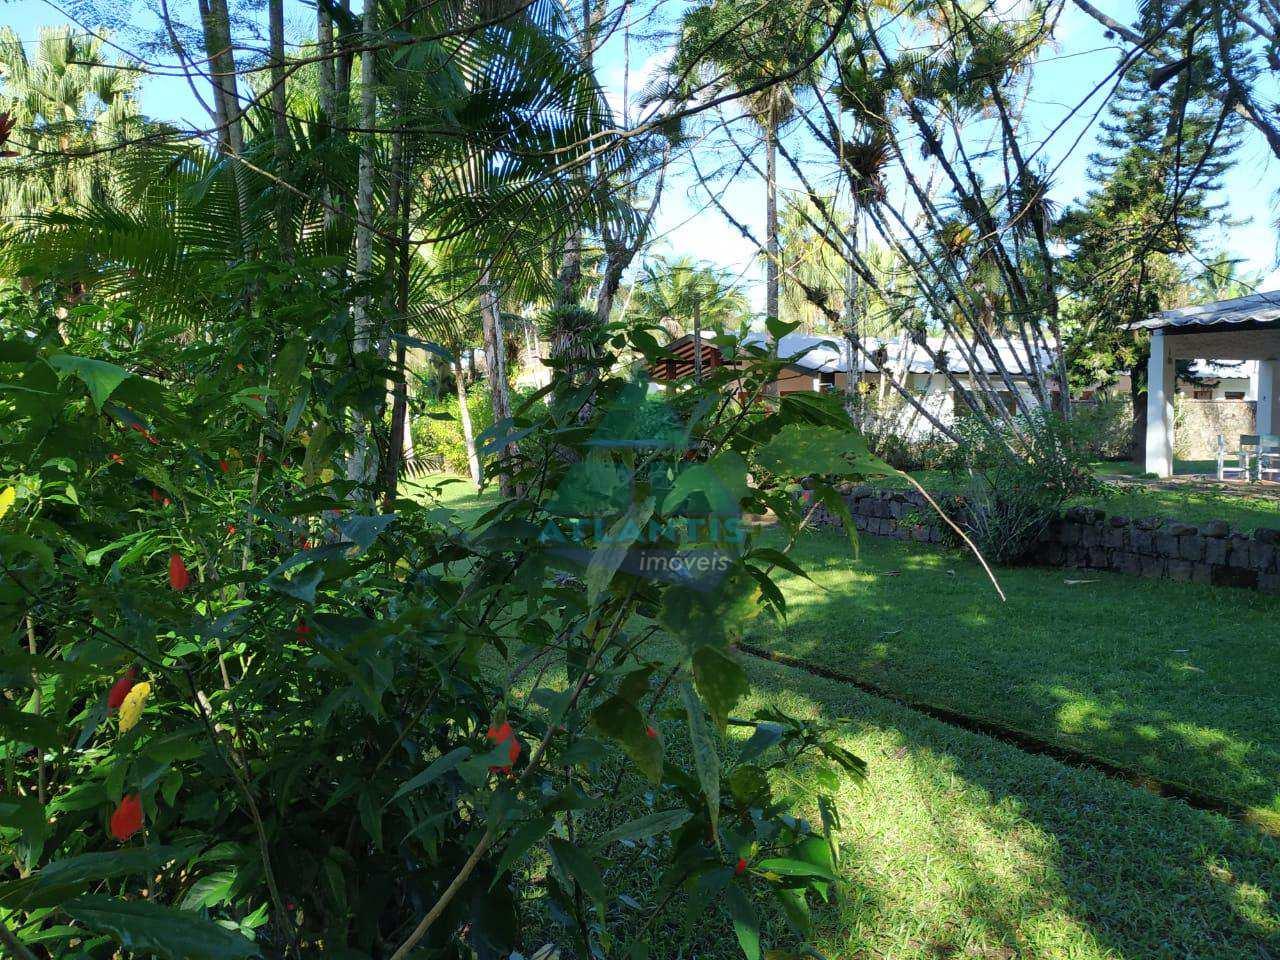 Casa com 4 dorms, Praia Dura, Ubatuba - R$ 750 mil, Cod: 1117